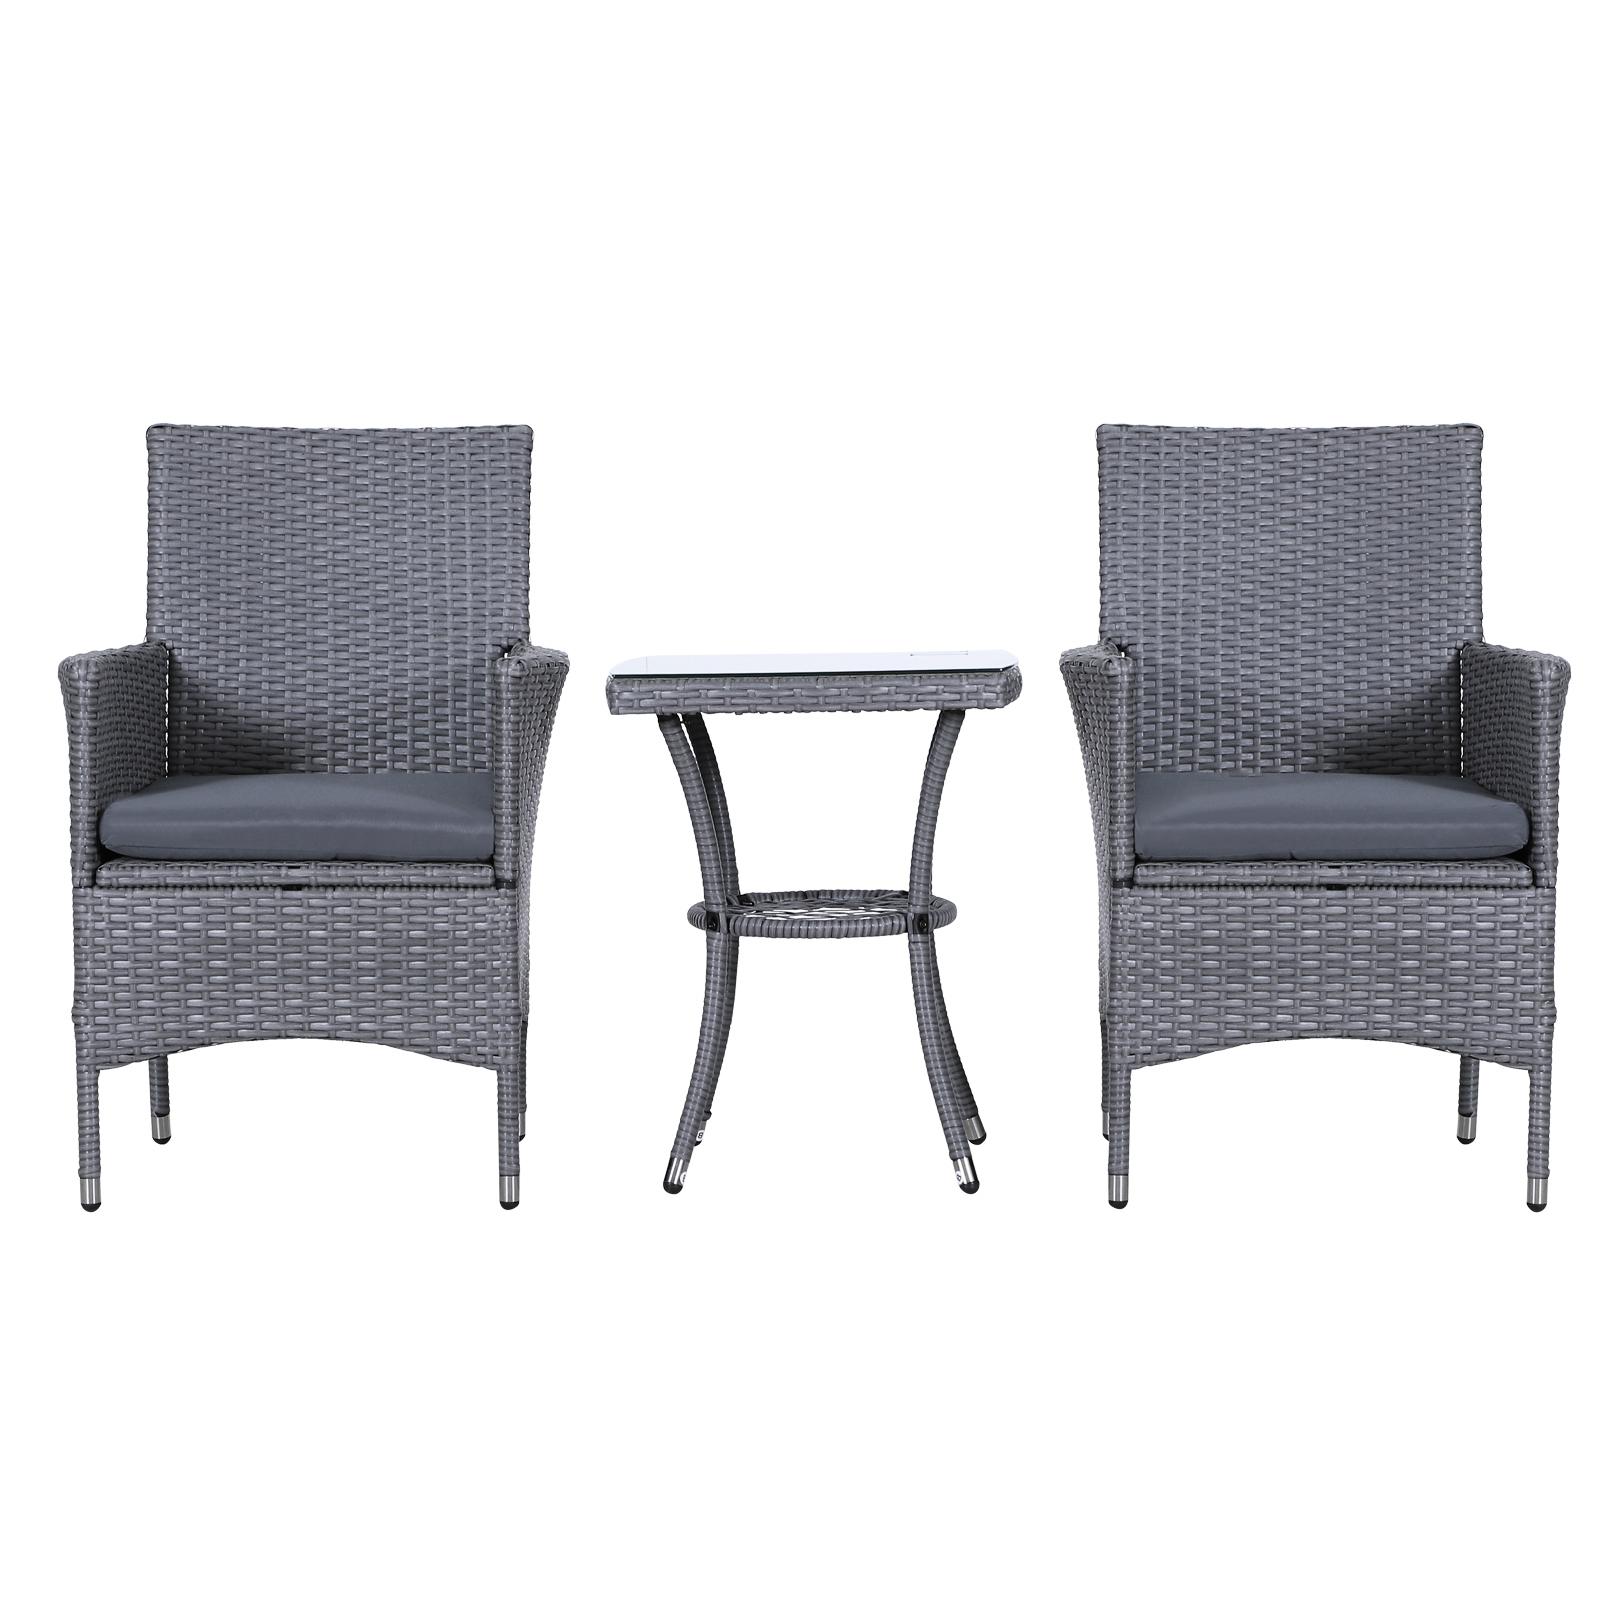 3 Pieces Patio Set Rattan Furniture Chair Bistro Grey ...